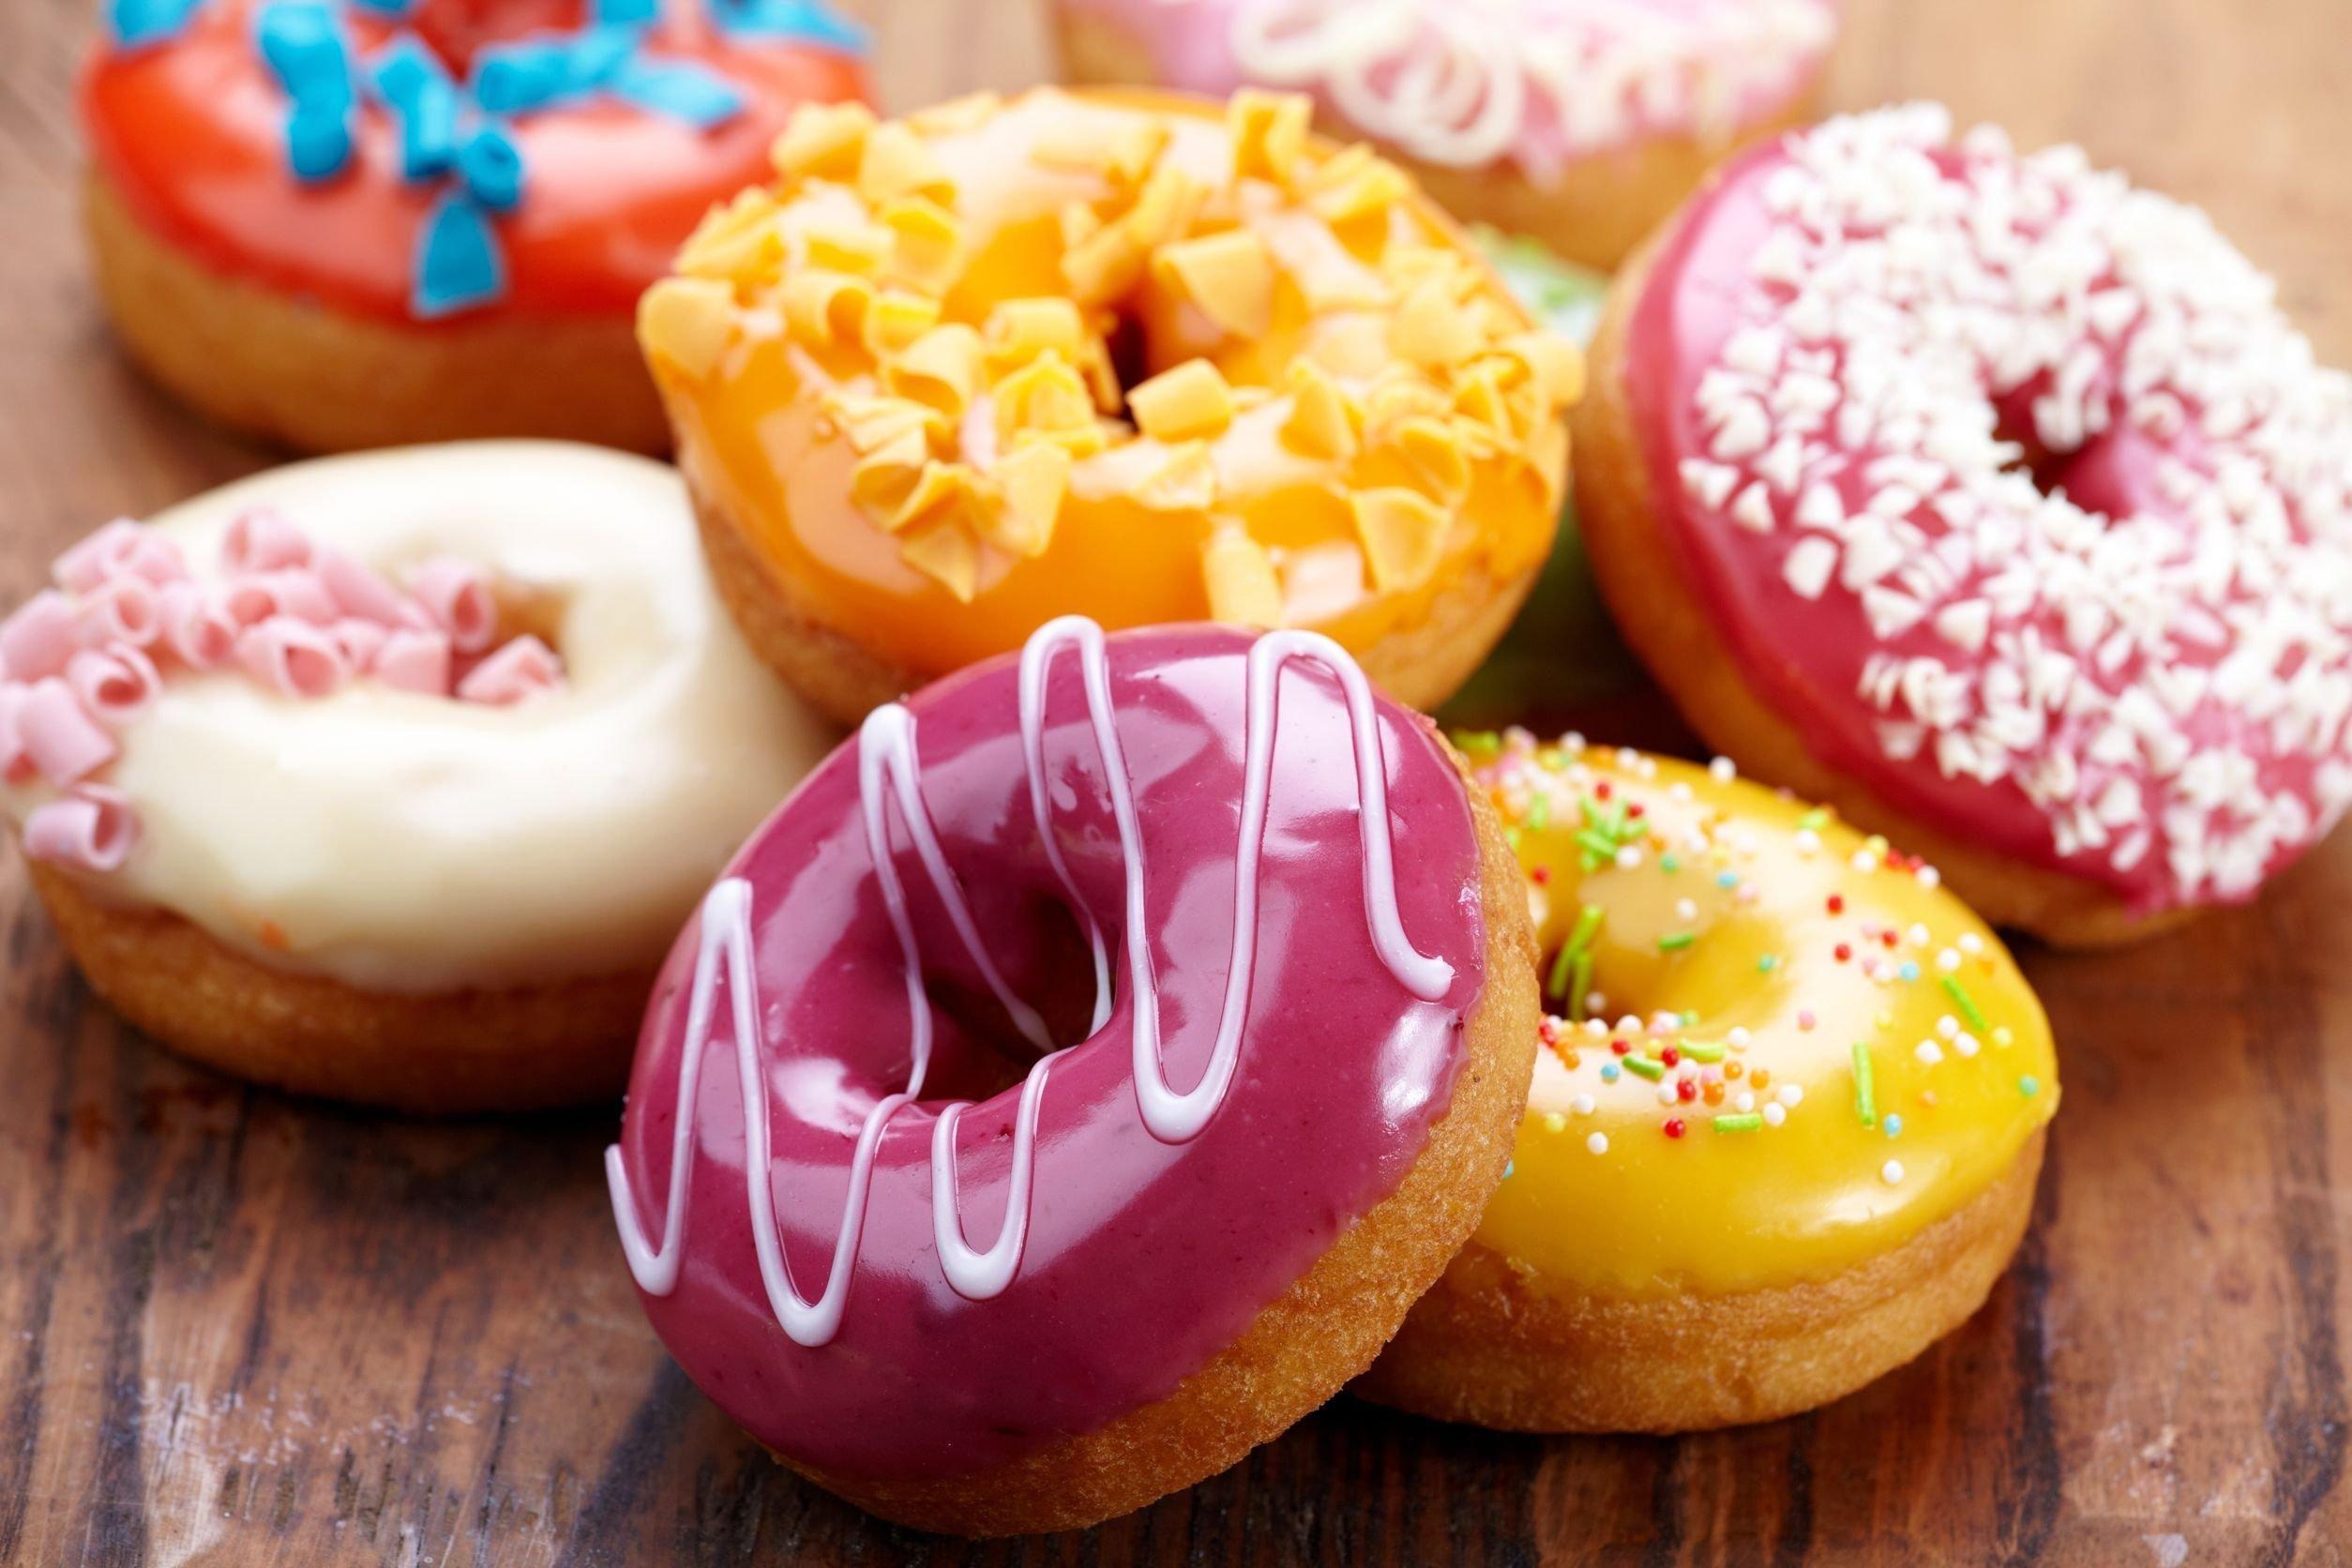 Can Hypoglycemia Turn Into Type 2 Diabetes?